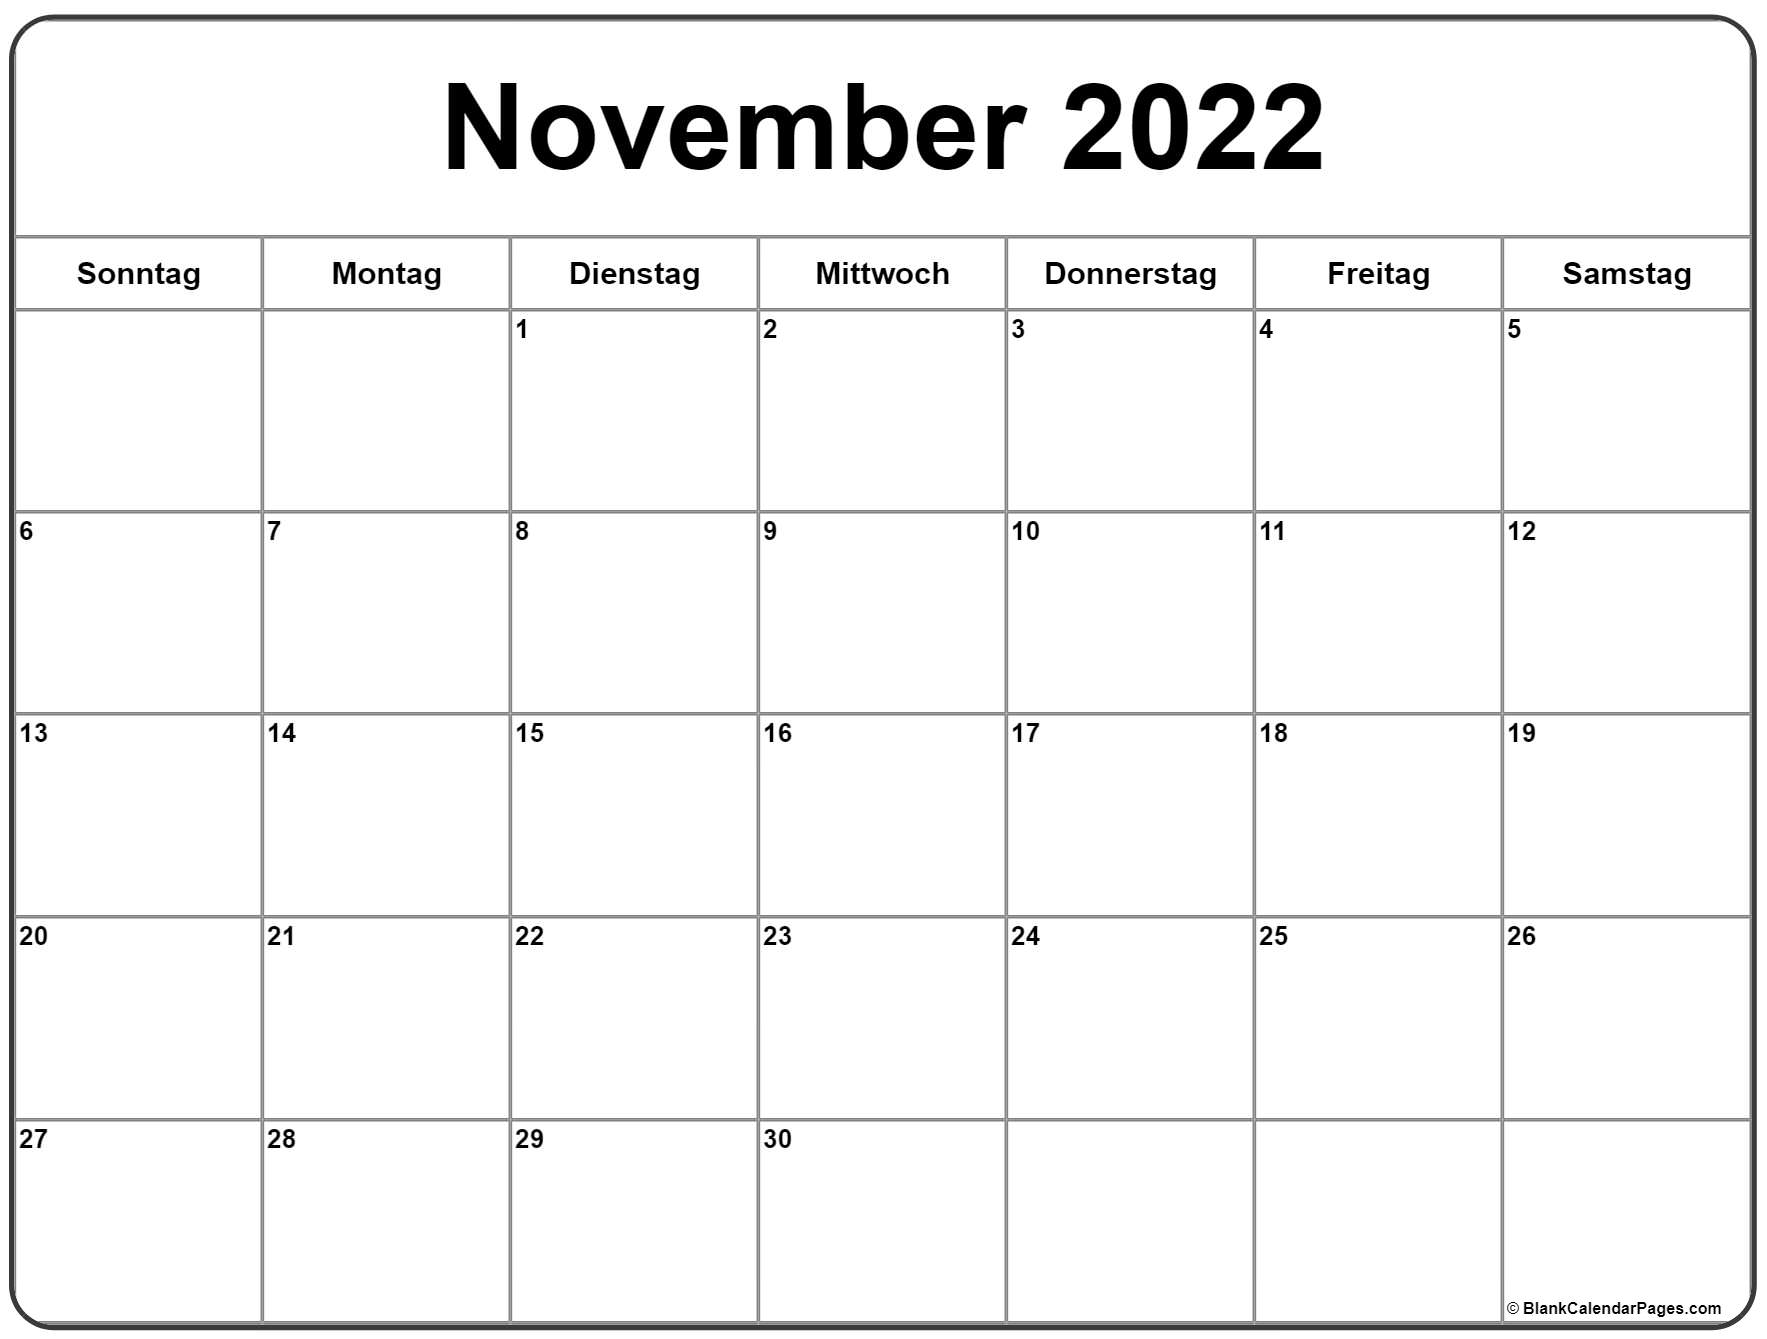 November 2022 kalender